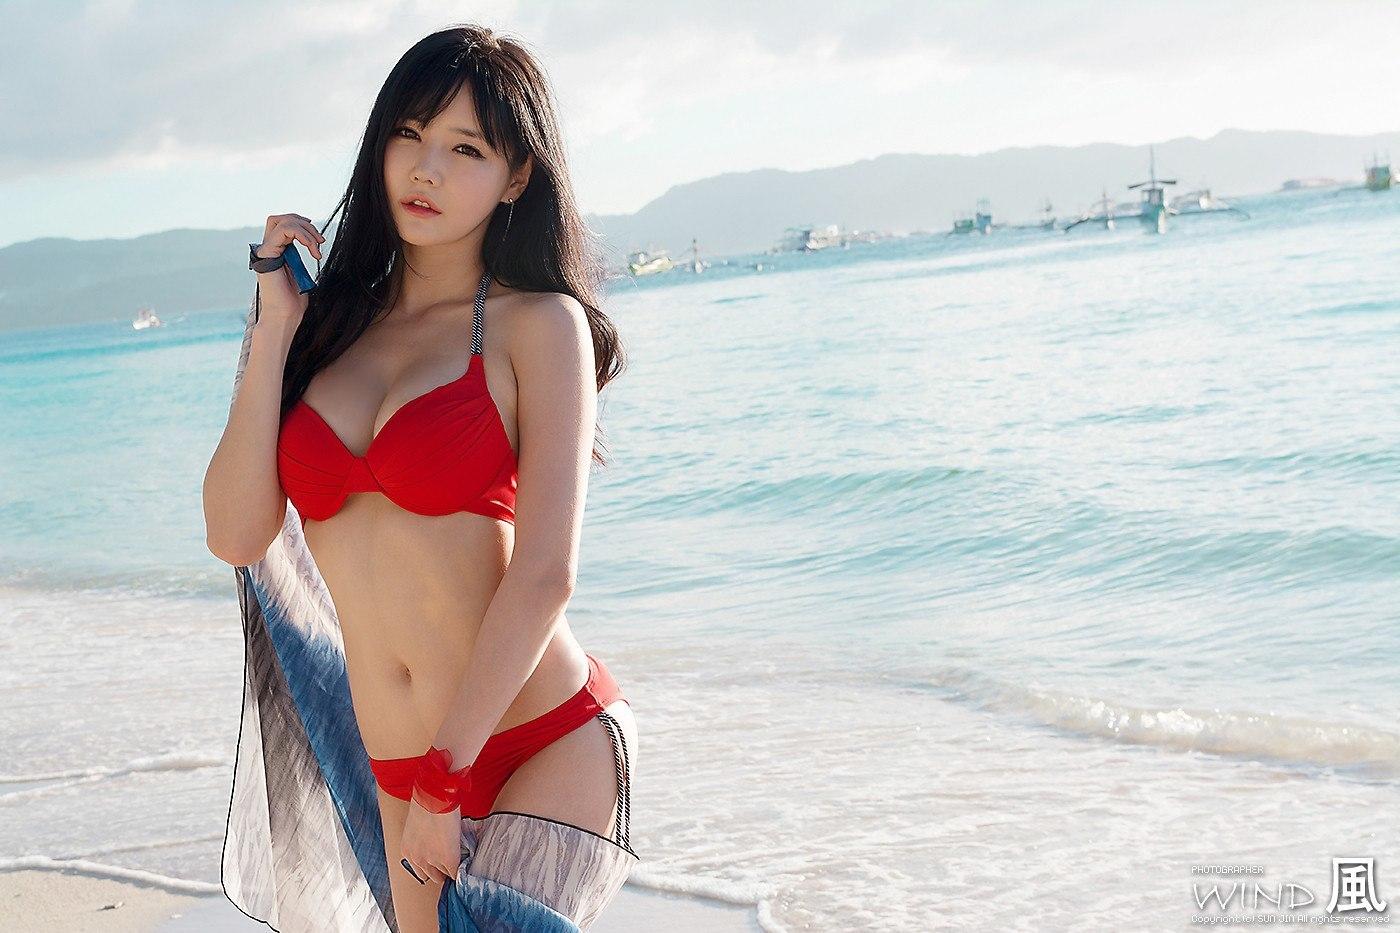 Sexy Bikini Photoshoot